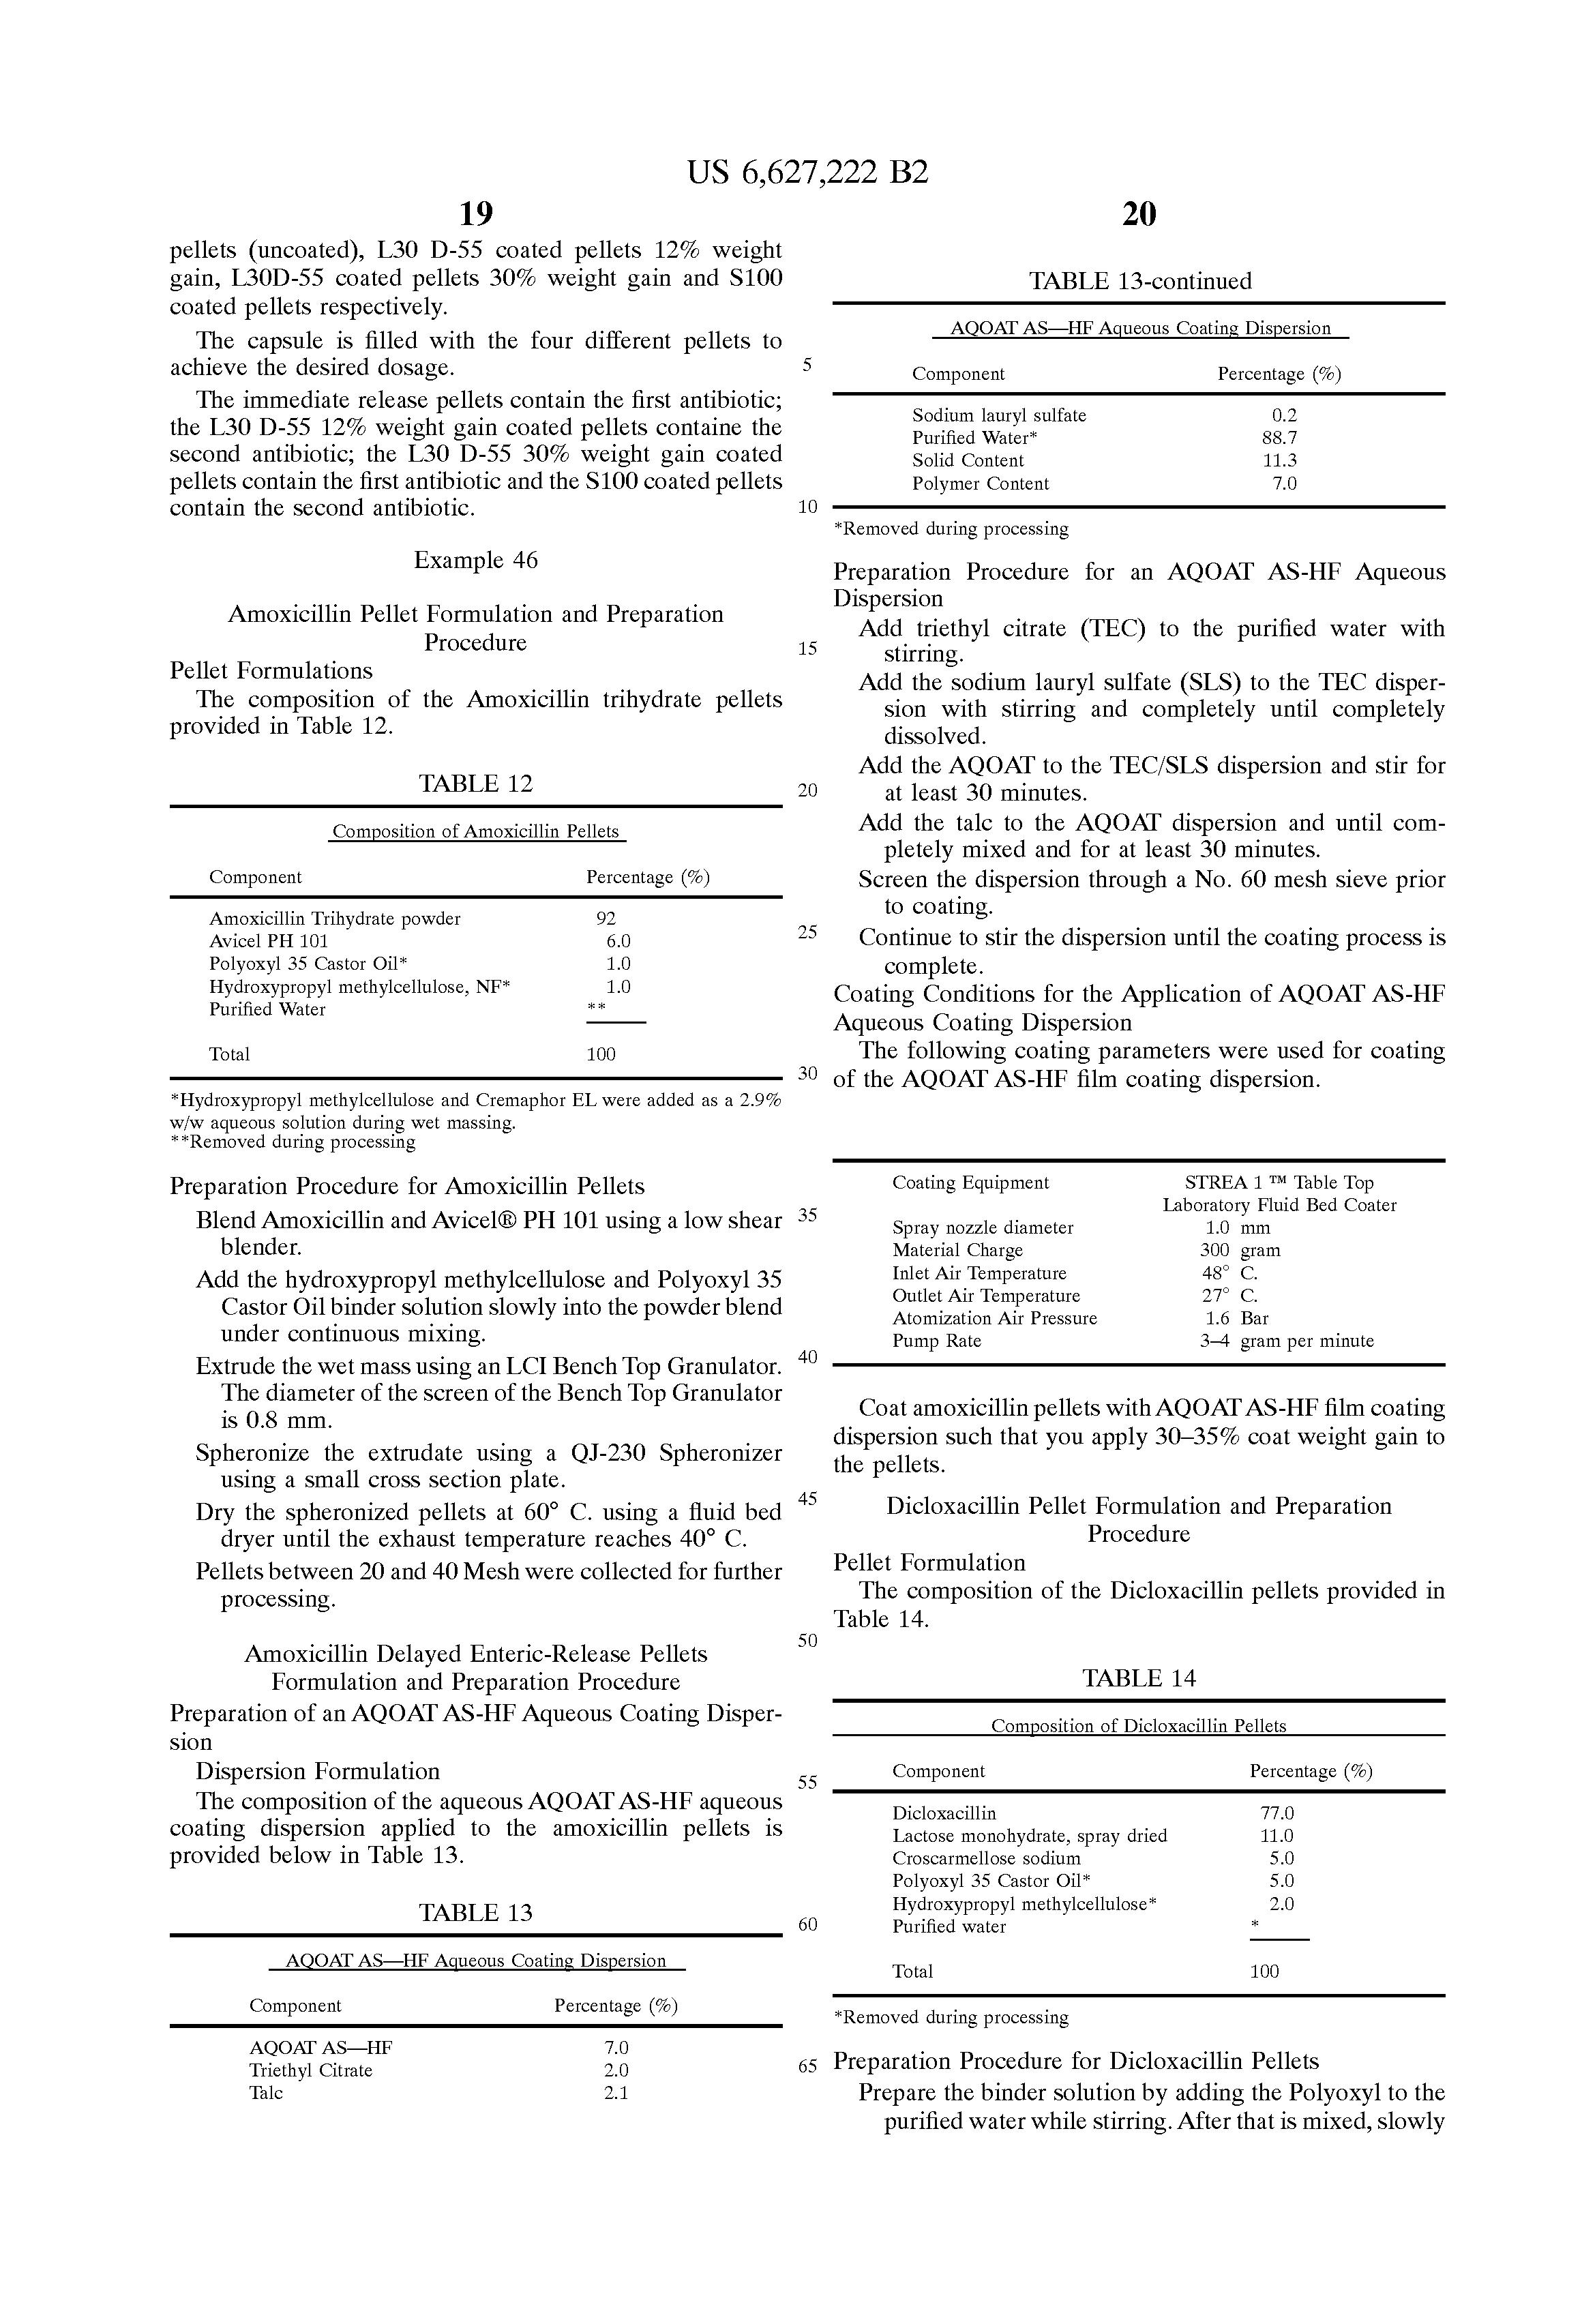 Trimox Dosage Forms